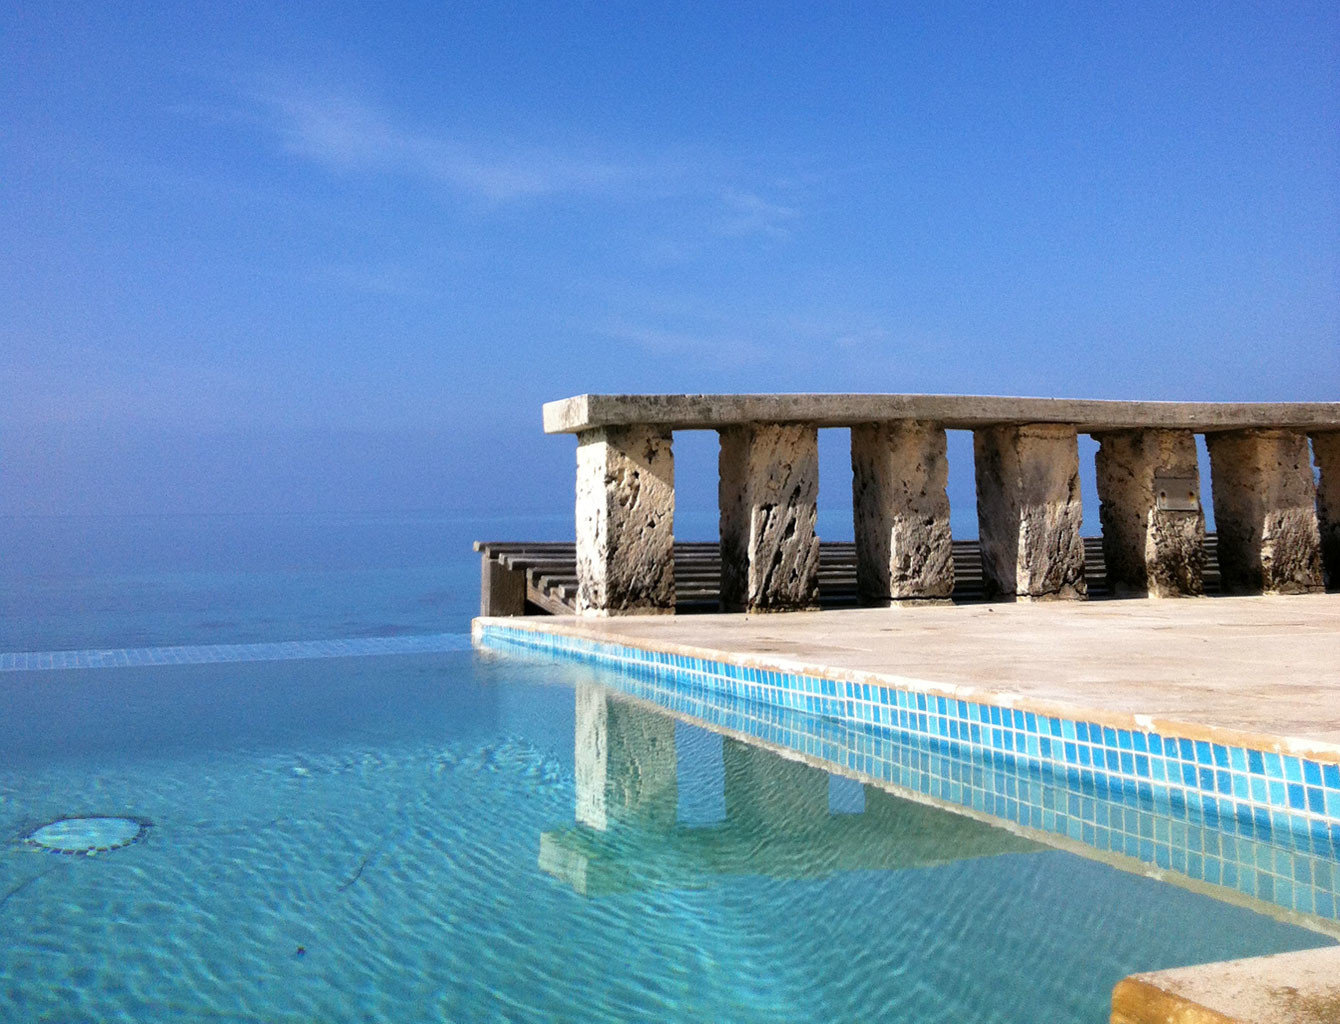 Adult-only Beach Beachfront Honeymoon Hotels Pool Romance Romantic Tropical Waterfront sky water Sea outdoor swimming pool Ocean vacation Coast pier bay breakwater blue